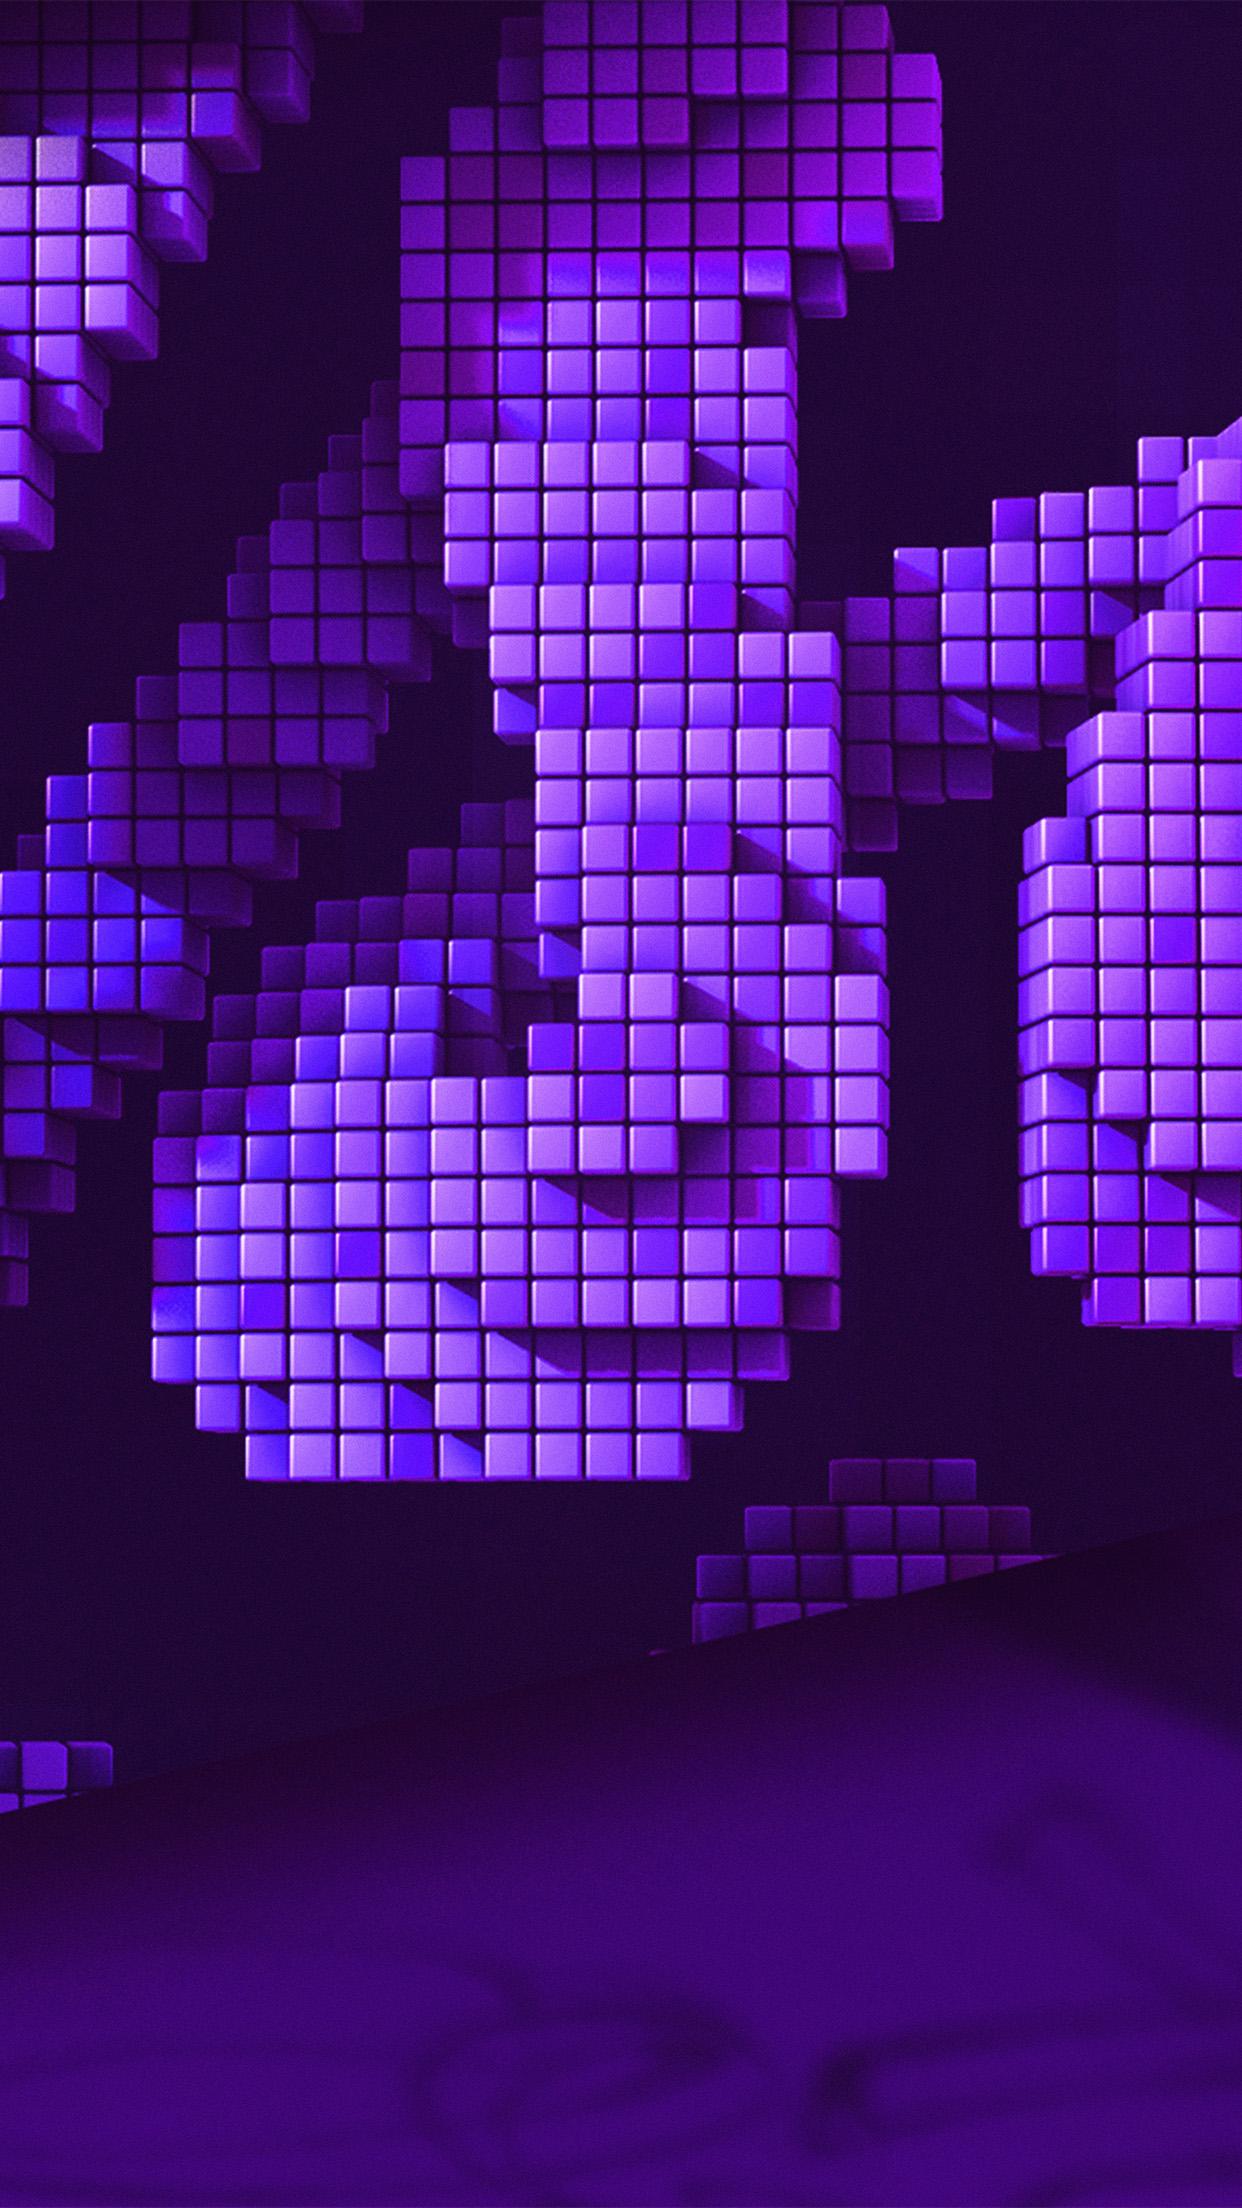 Iphone6papers Com Iphone 6 Wallpaper Vw92 Digital Pixel Art